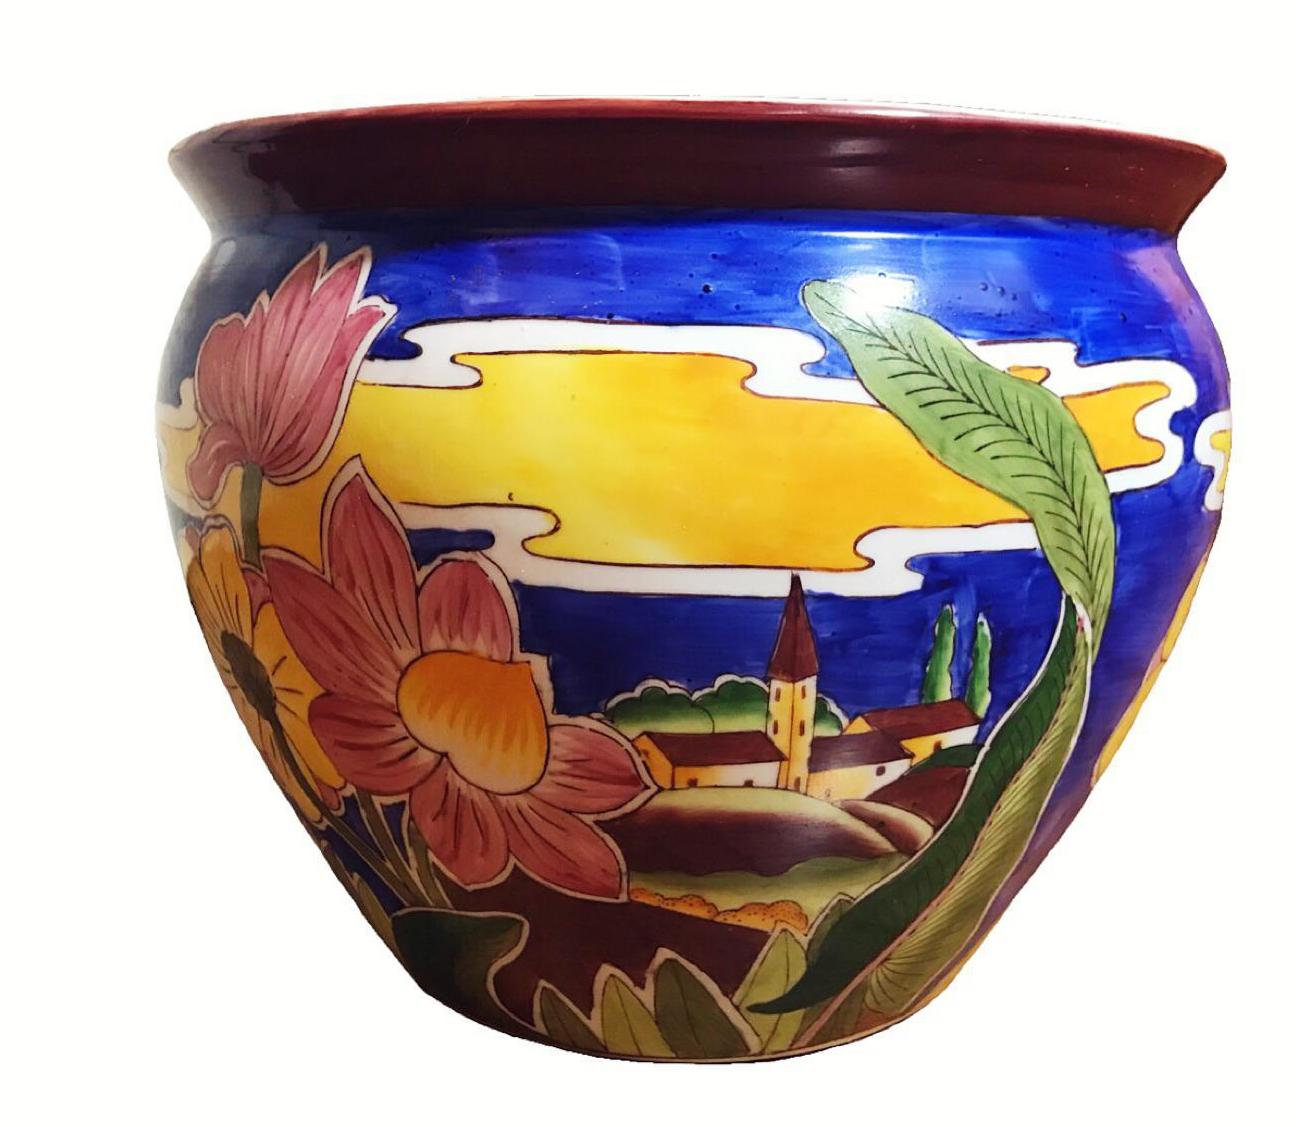 Porcelain Chinese Fish Bowl Planter Chairish